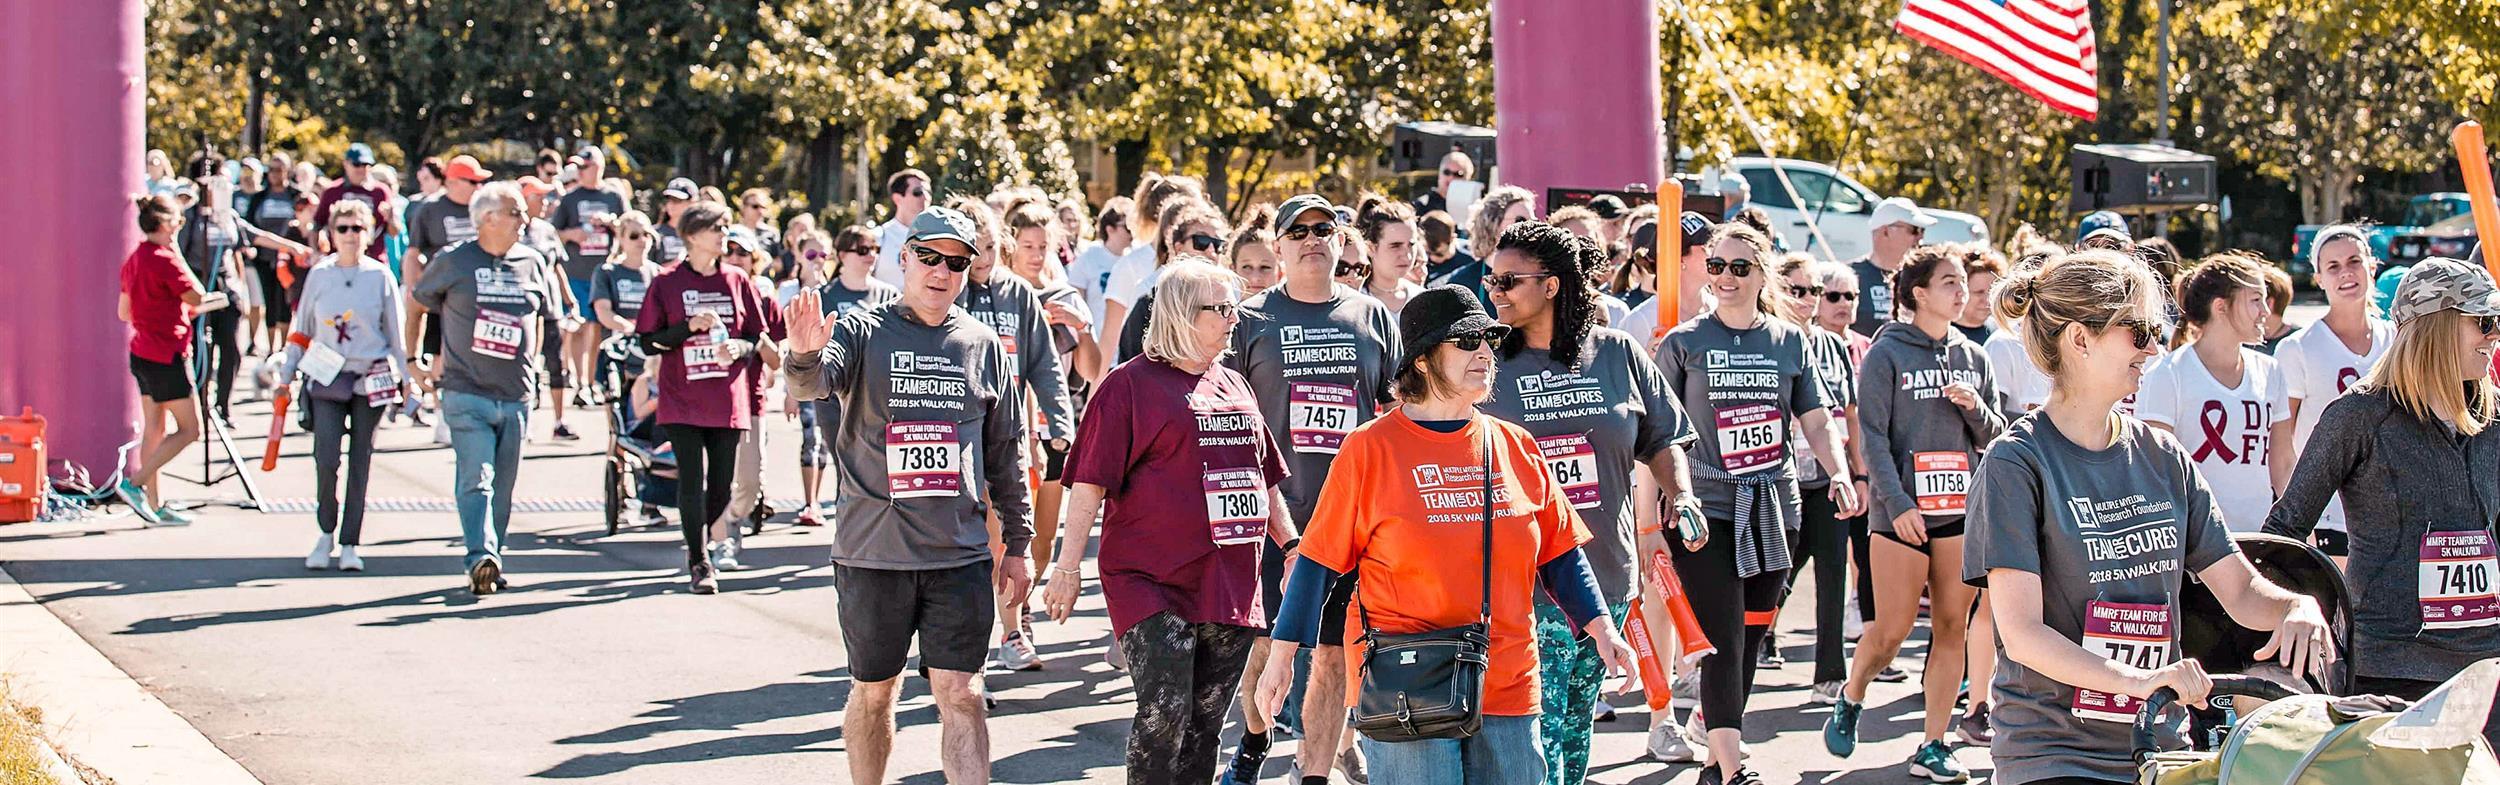 MMRF Team for Cures 5K Walk/Run @ Ronald Kirk Bridge